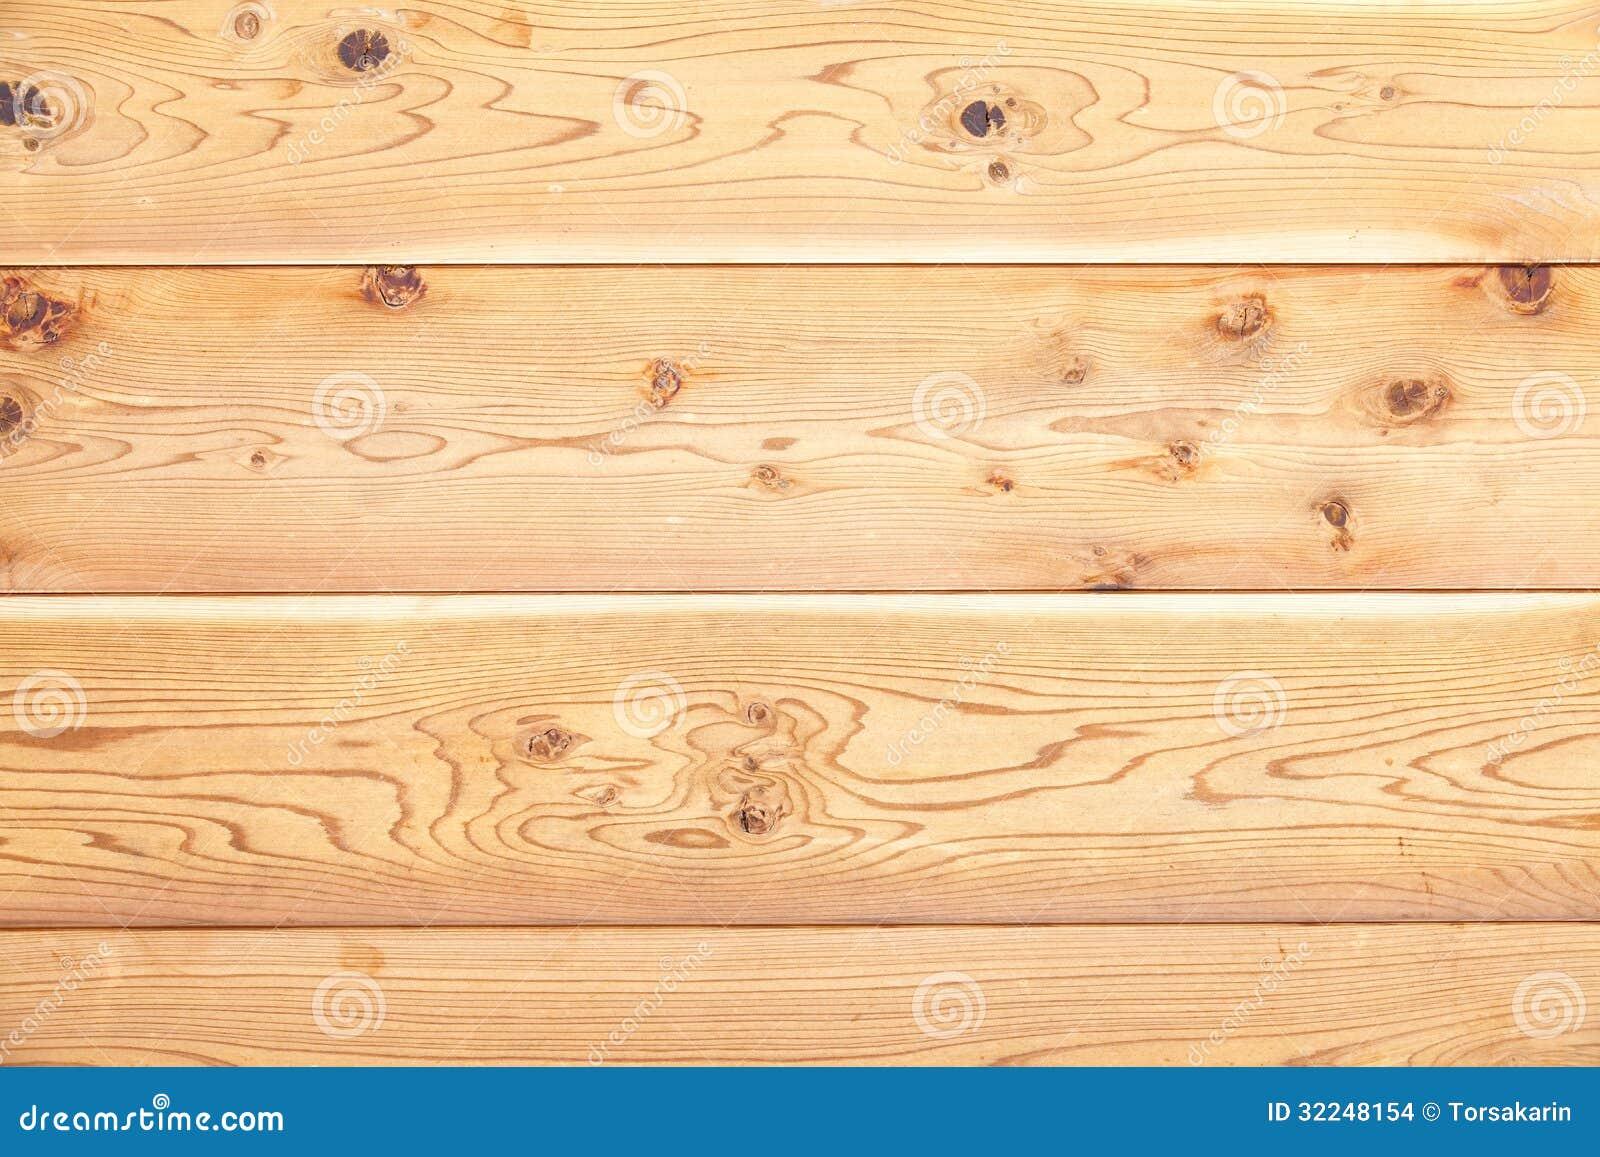 Textura de madeira. fundo